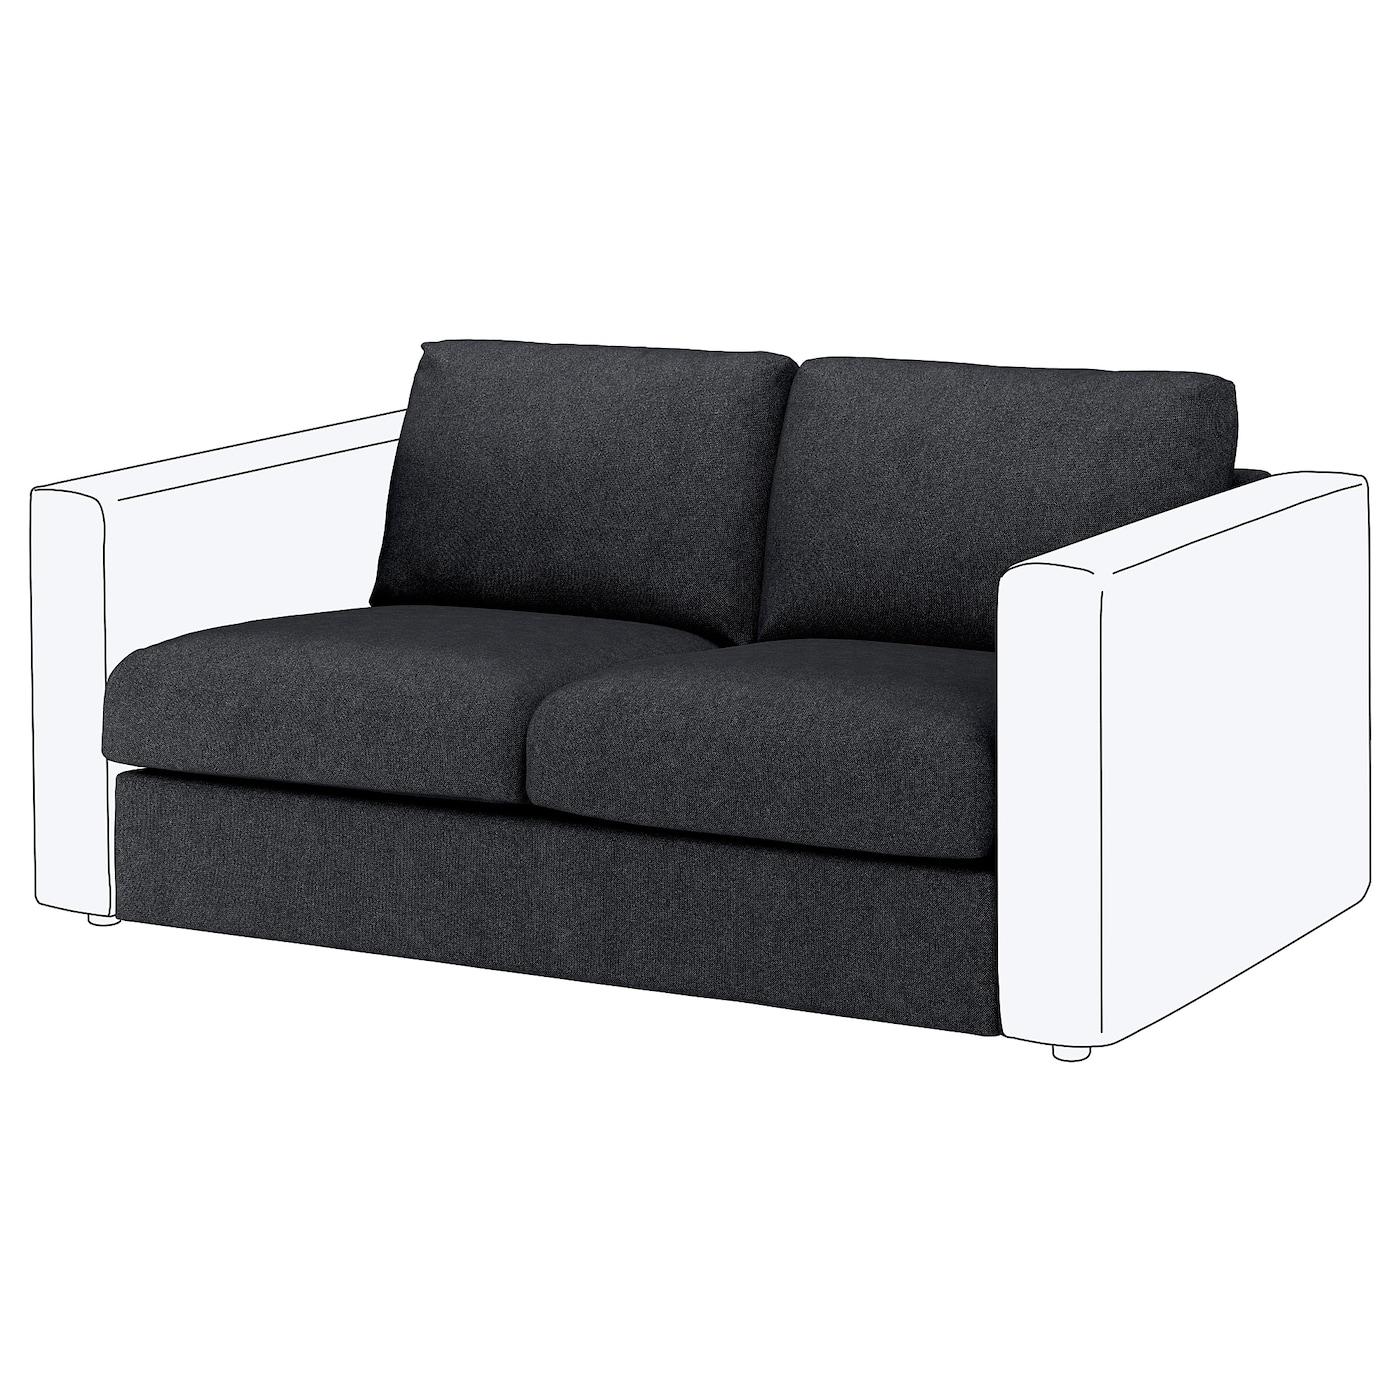 VIMLE, Sitzelement 2, Tallmyra schwarz/grau, 492.535.24